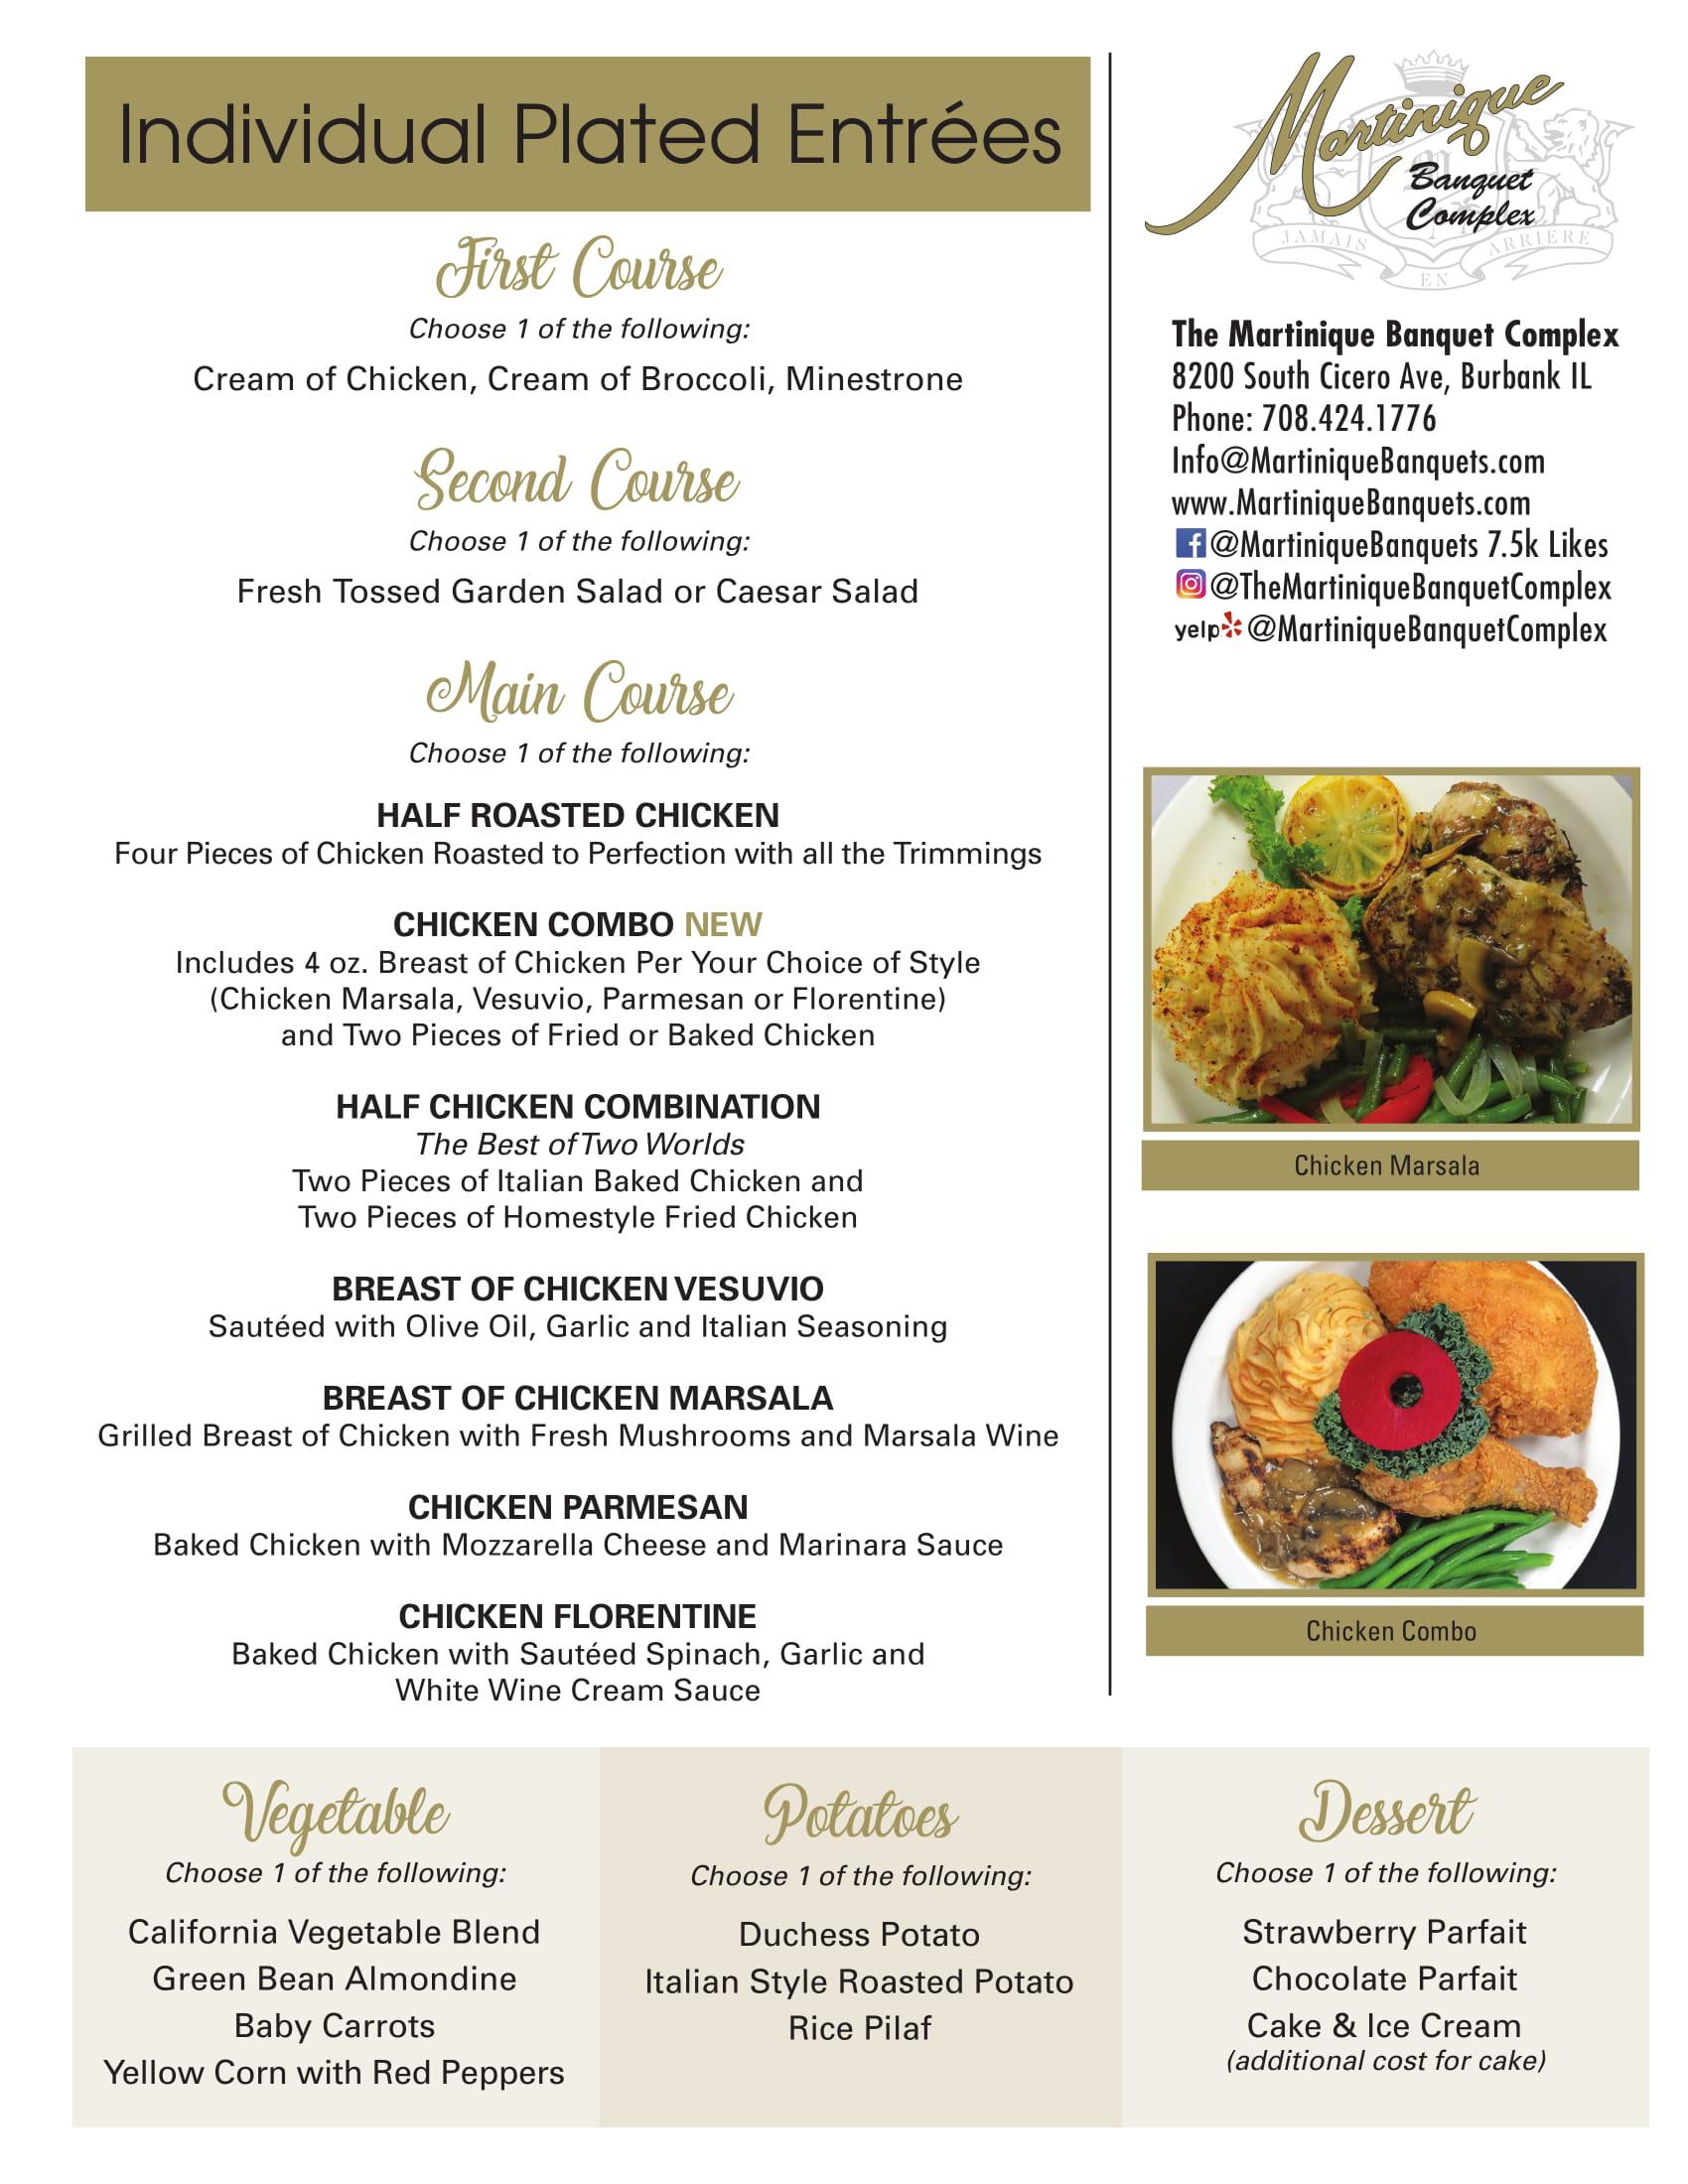 plated-entree-menu-1